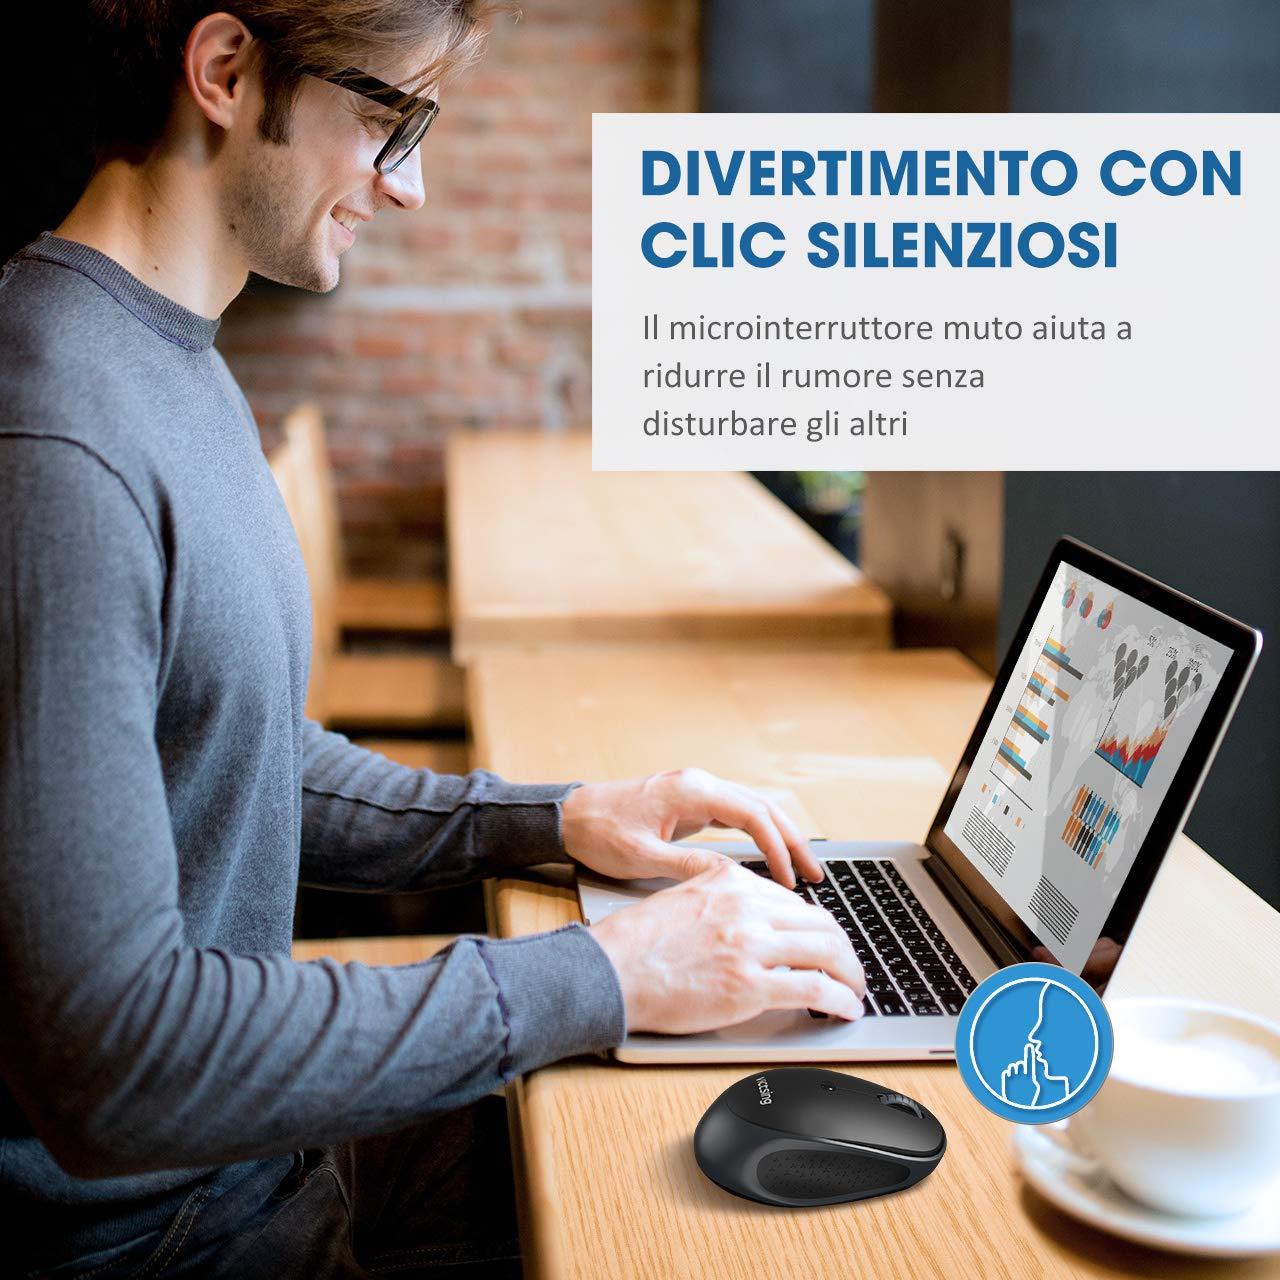 800//1200//1600//2000//2400 DPI Mouse Wireless a 6 Pulsanti per PC Windows Android VicTsing Mouse Bluetooth Silenzioso e Portatile Multi-Dispositivo Mac OS 36 Mesi in Standby